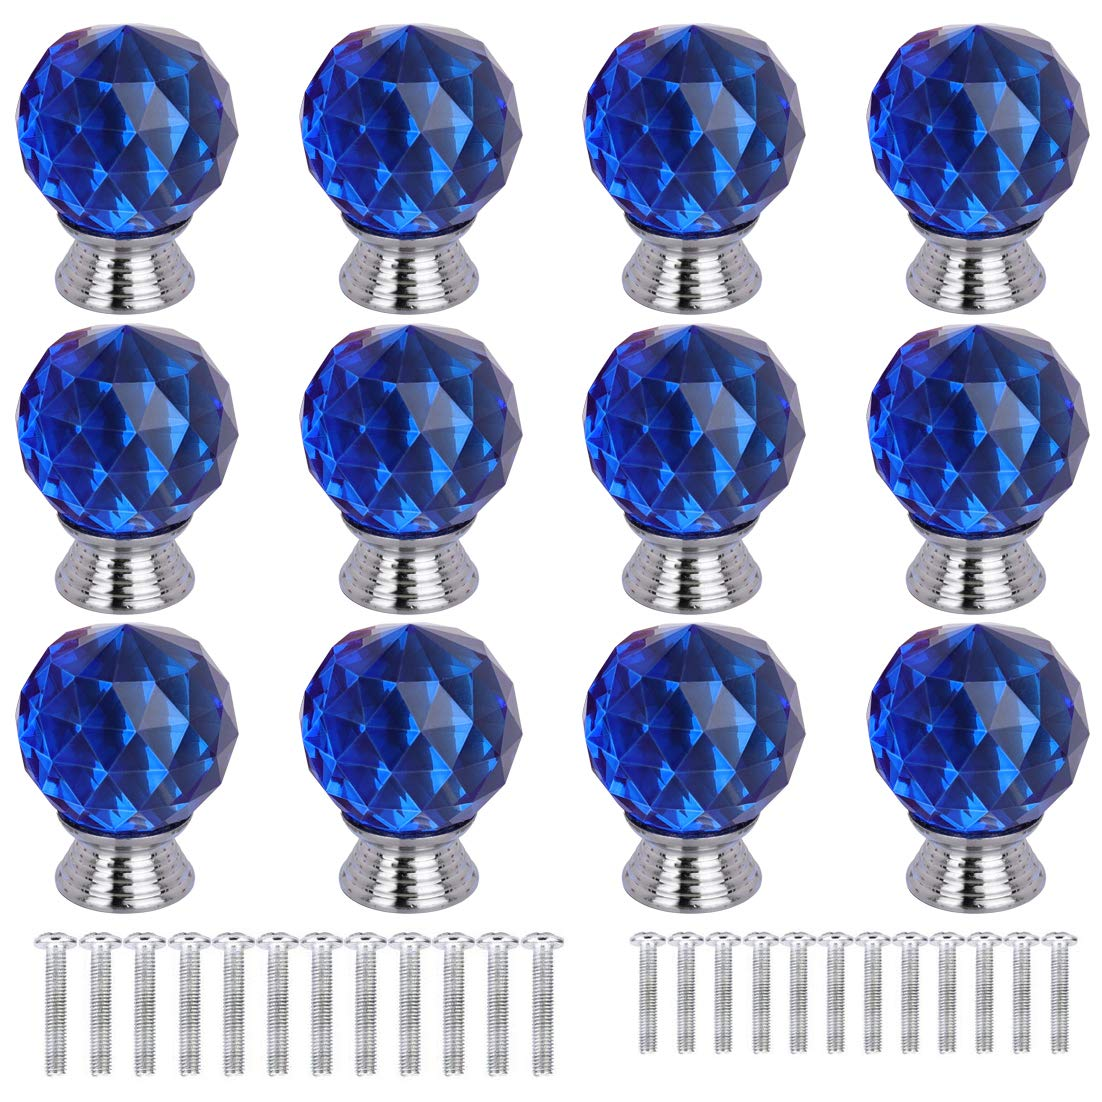 12 Tiradores - Simil Cristal (71KX2FN5)